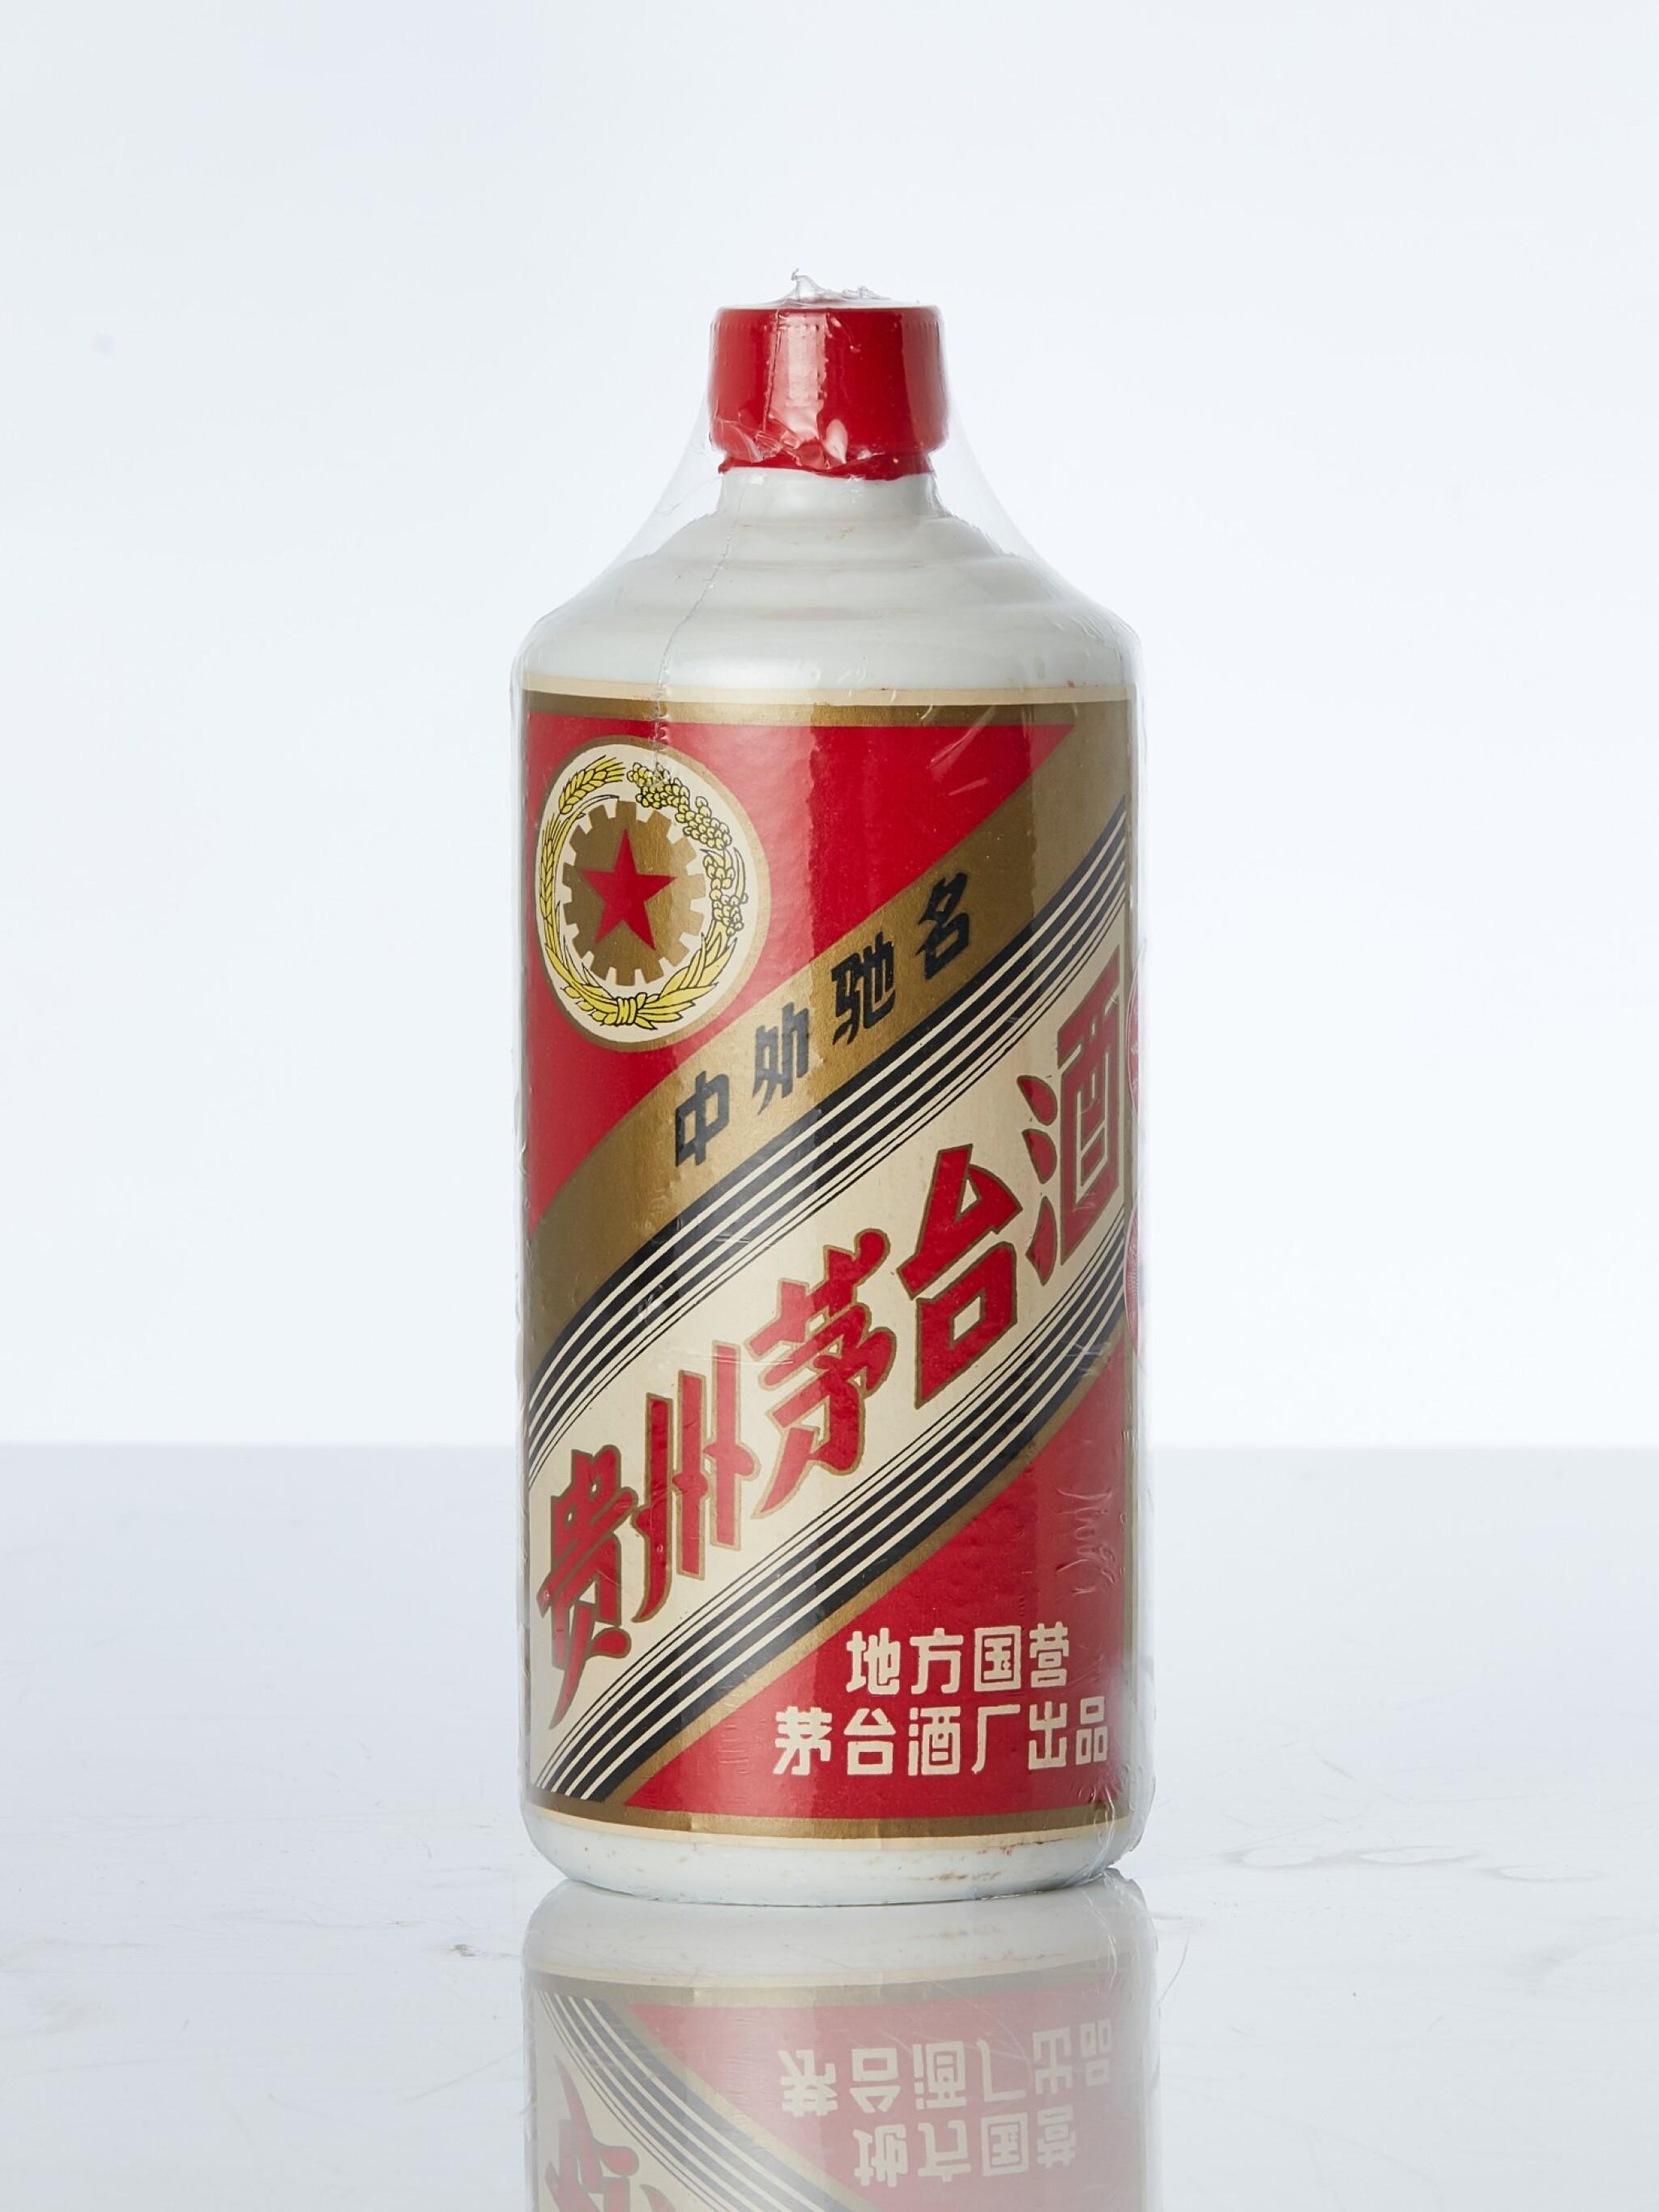 View full screen - View 1 of Lot 7718. 1986 年產五星牌貴州茅台酒 (地⽅國營)Kweichow Moutai 1986 (1 BT50).